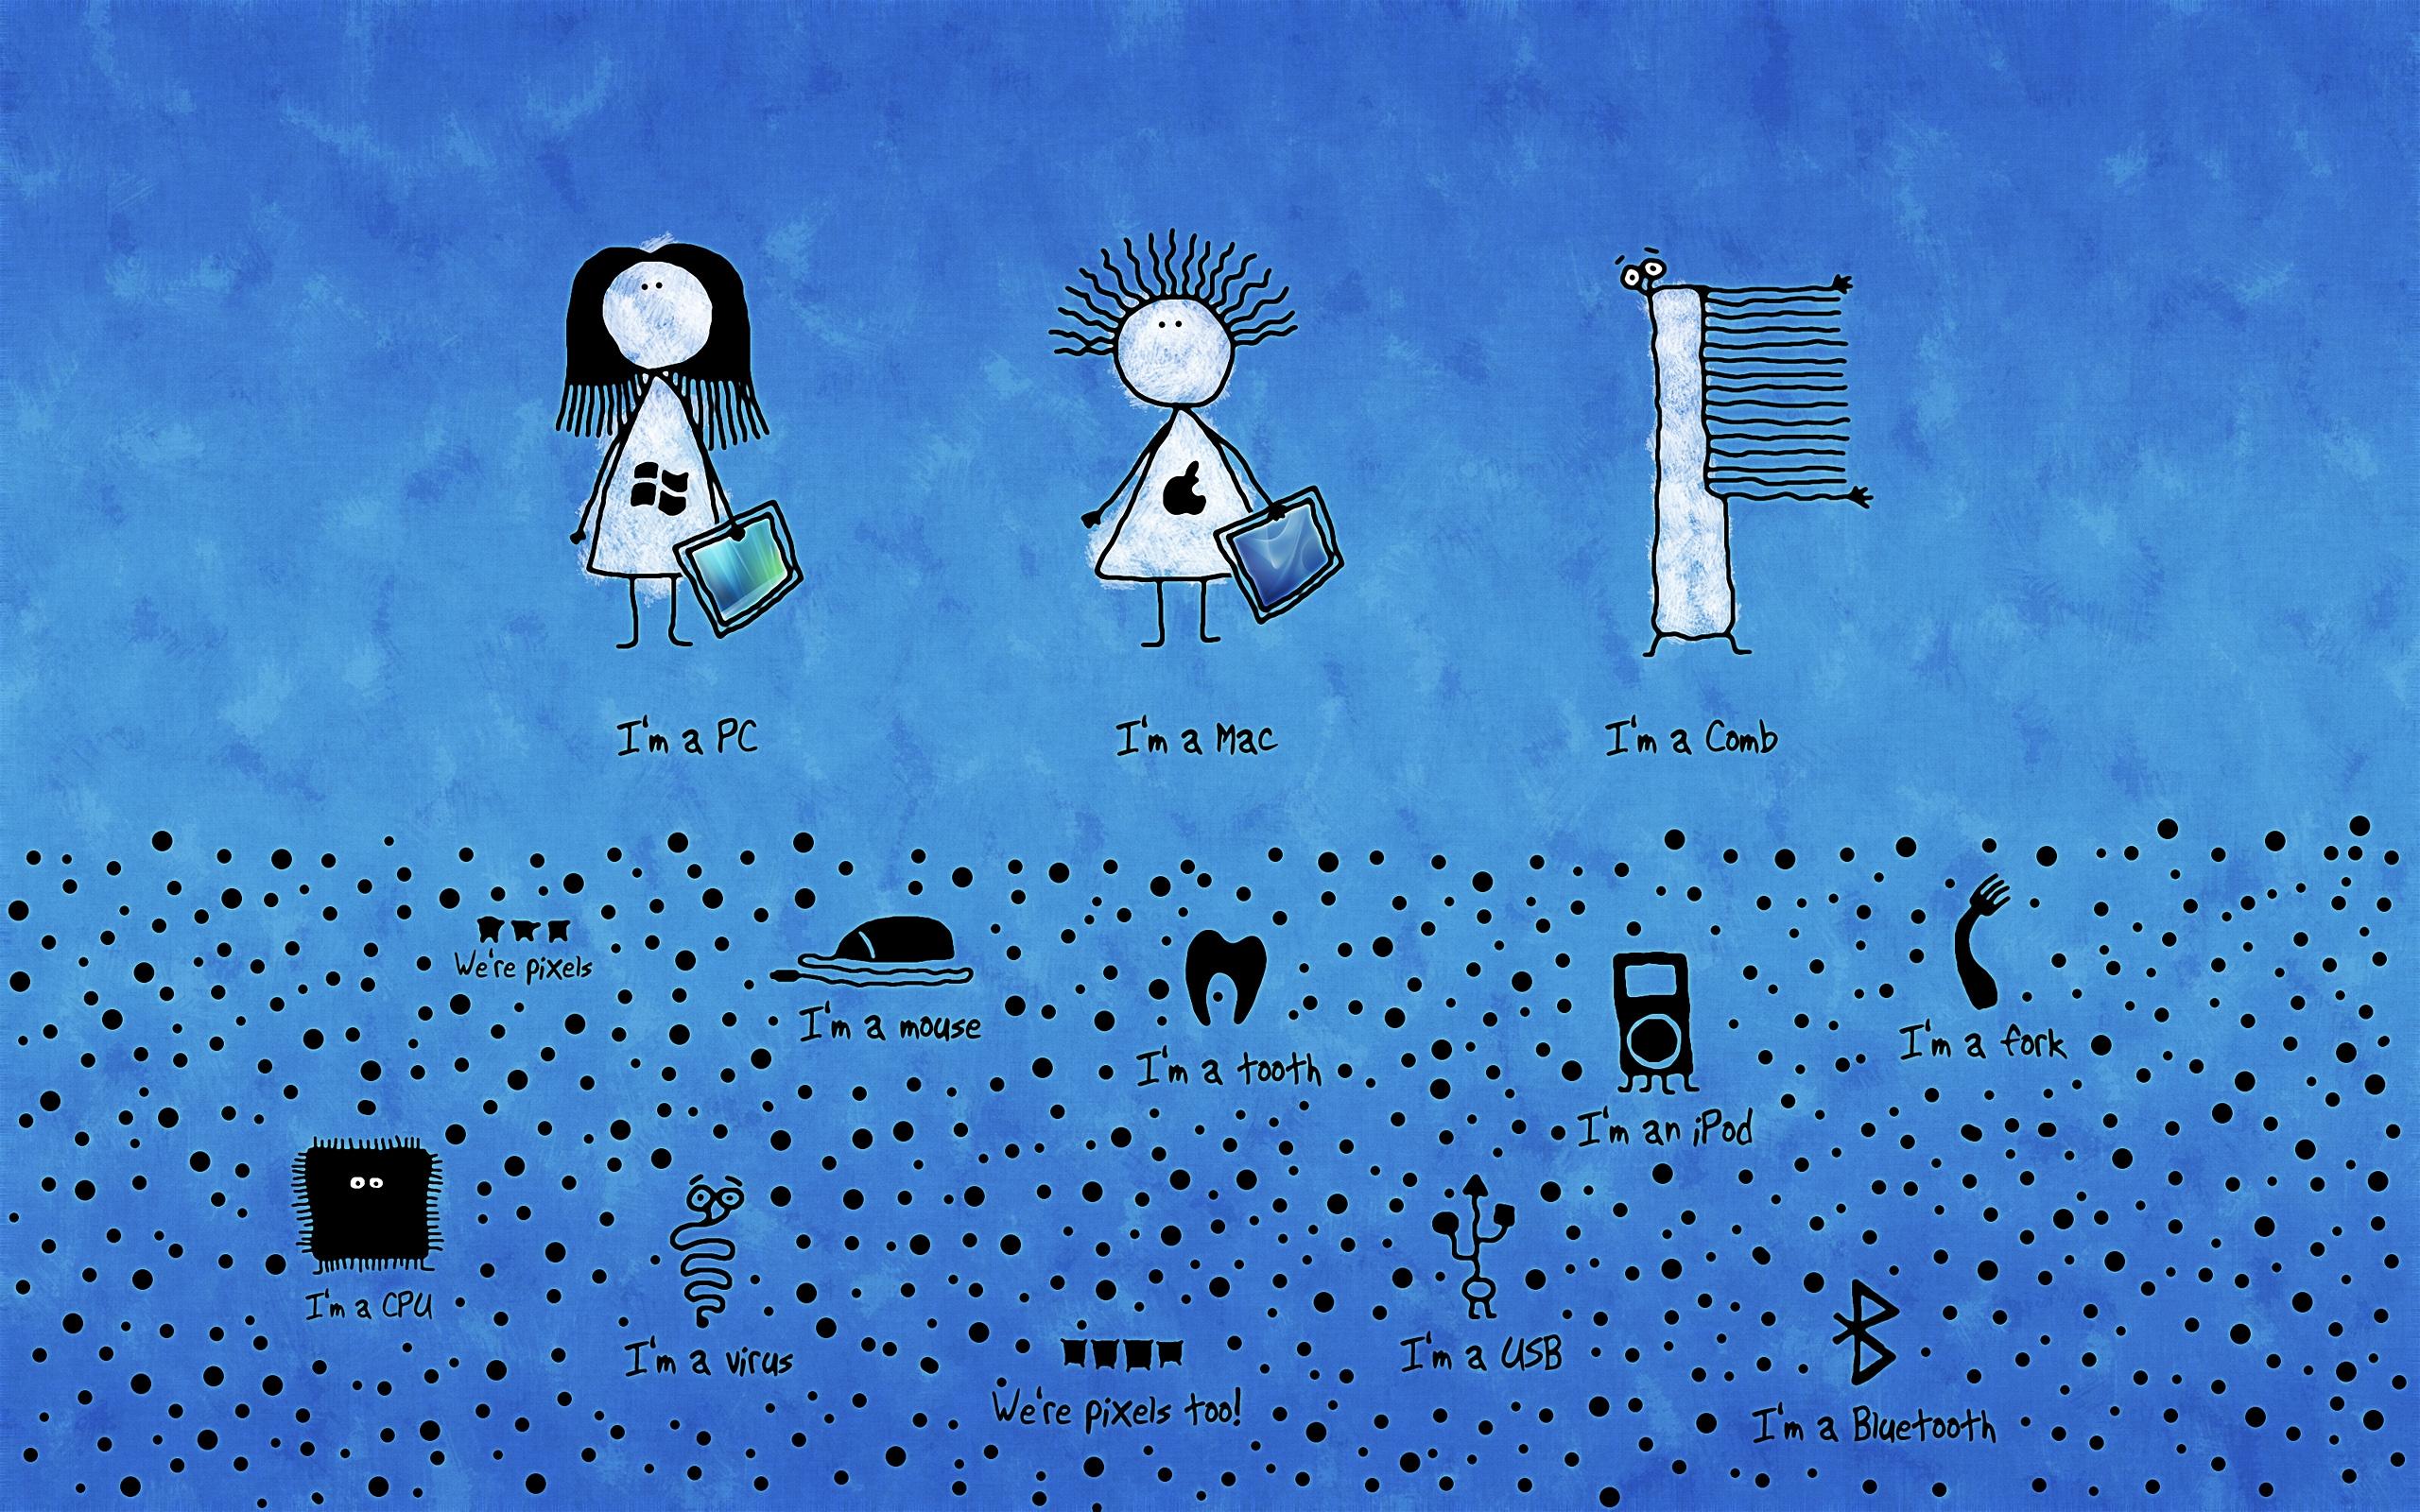 Funny MAC Cartoon Wallpaper by xCactusxQC on DeviantArt